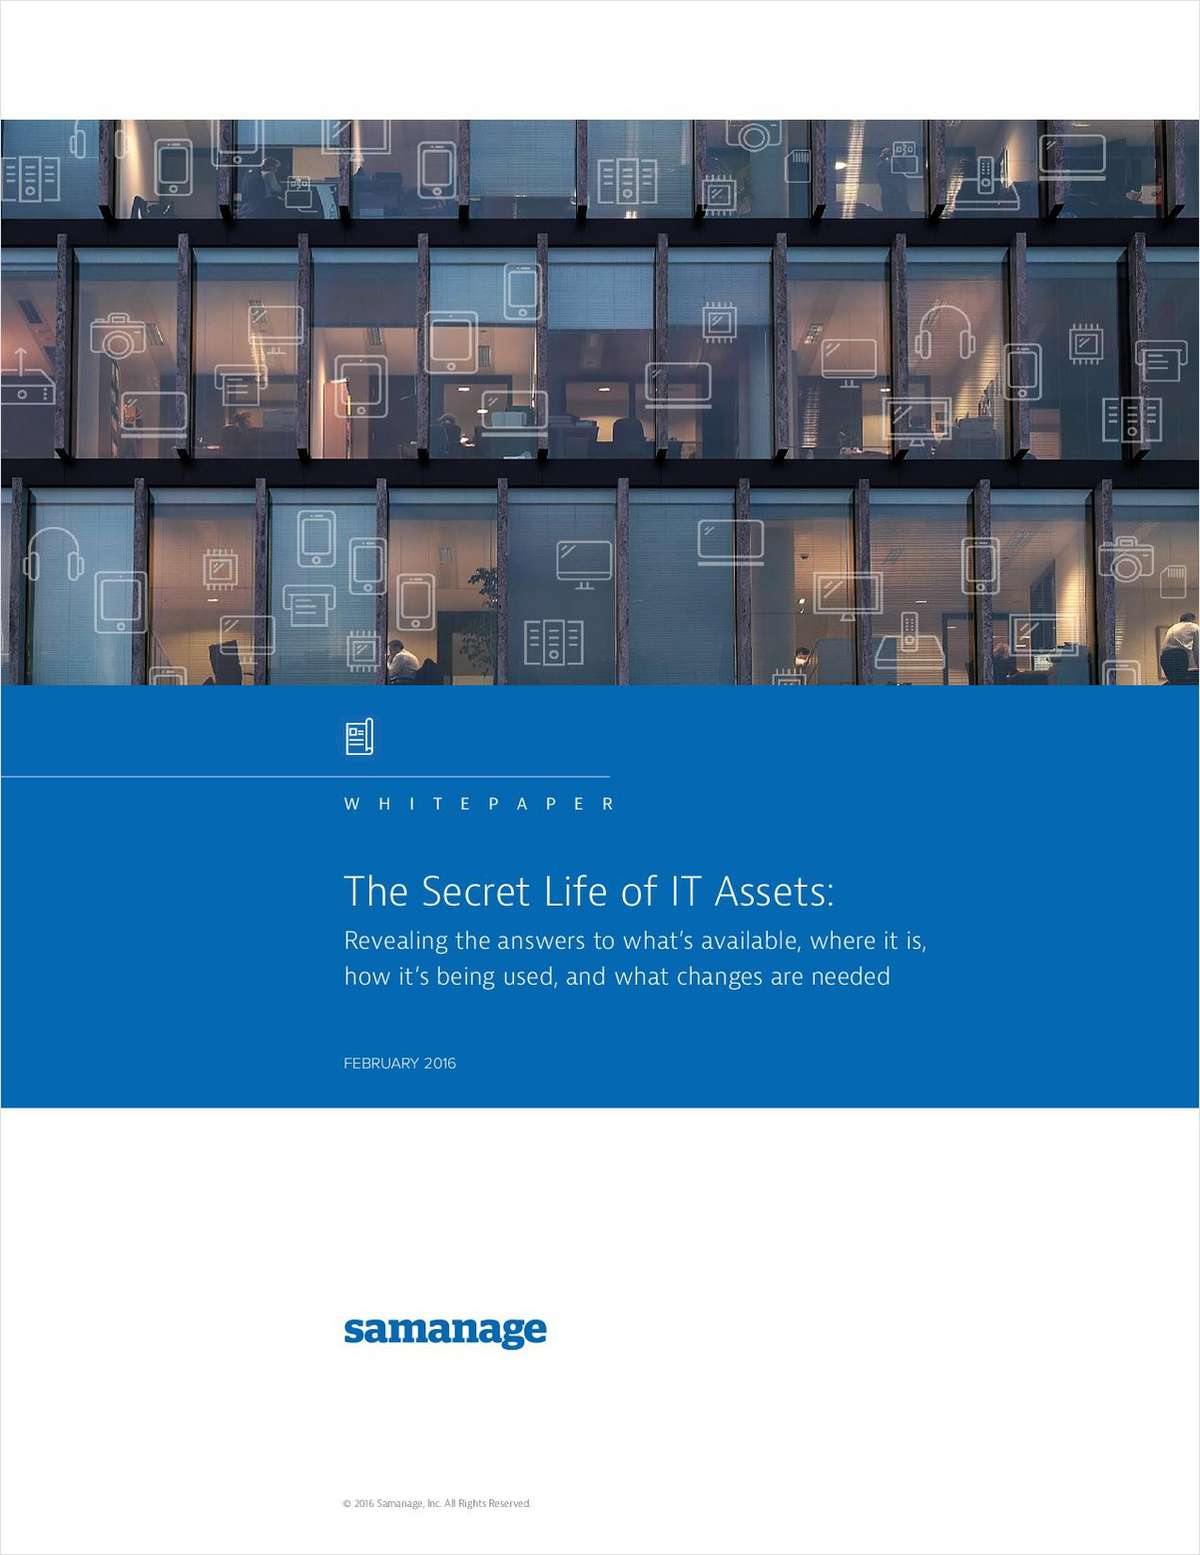 The Secret Life of IT Assets